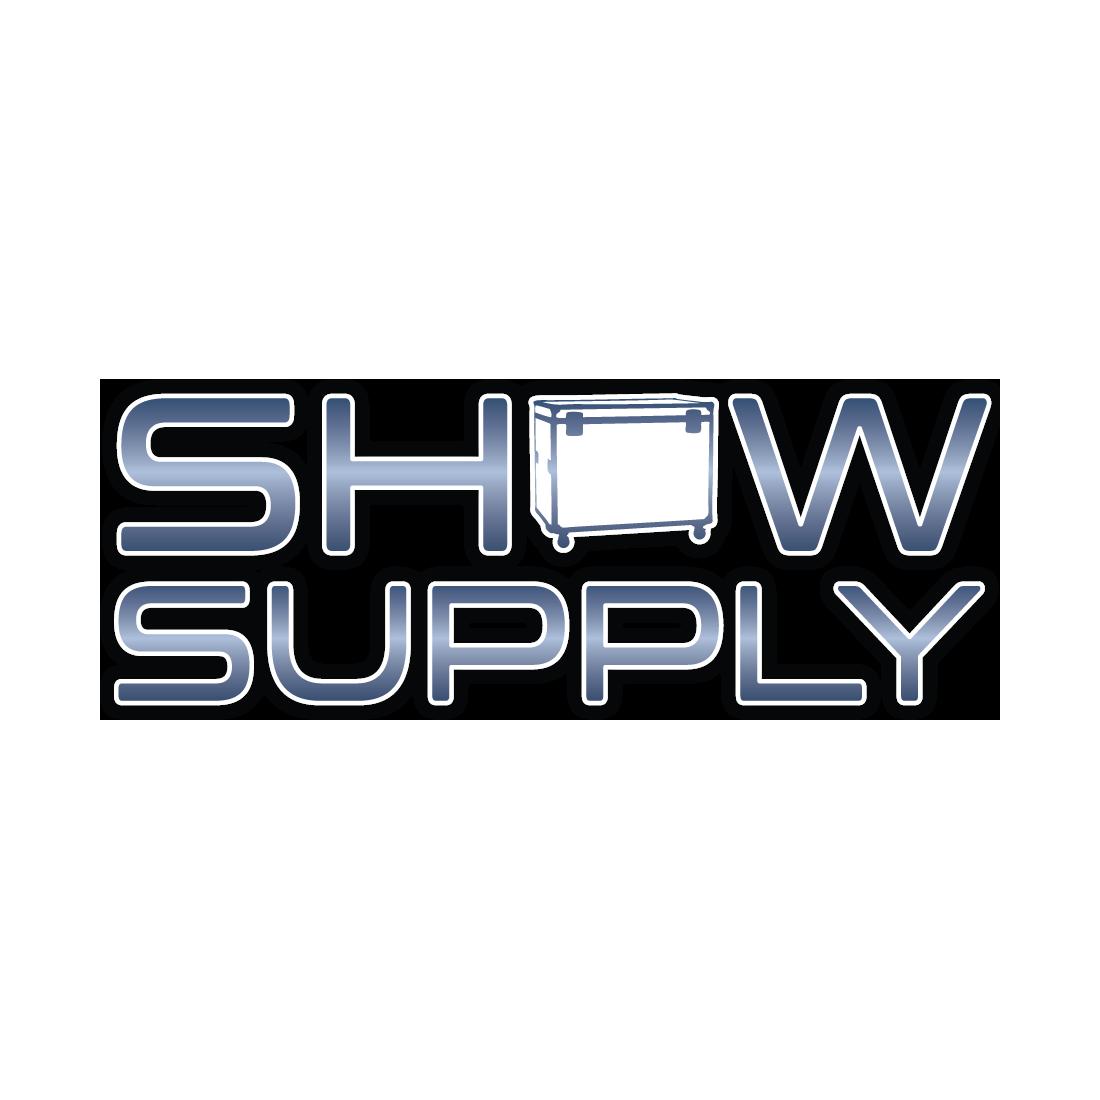 SW6000 Conference Management Software, Version 6.8 - Conference User Application Module